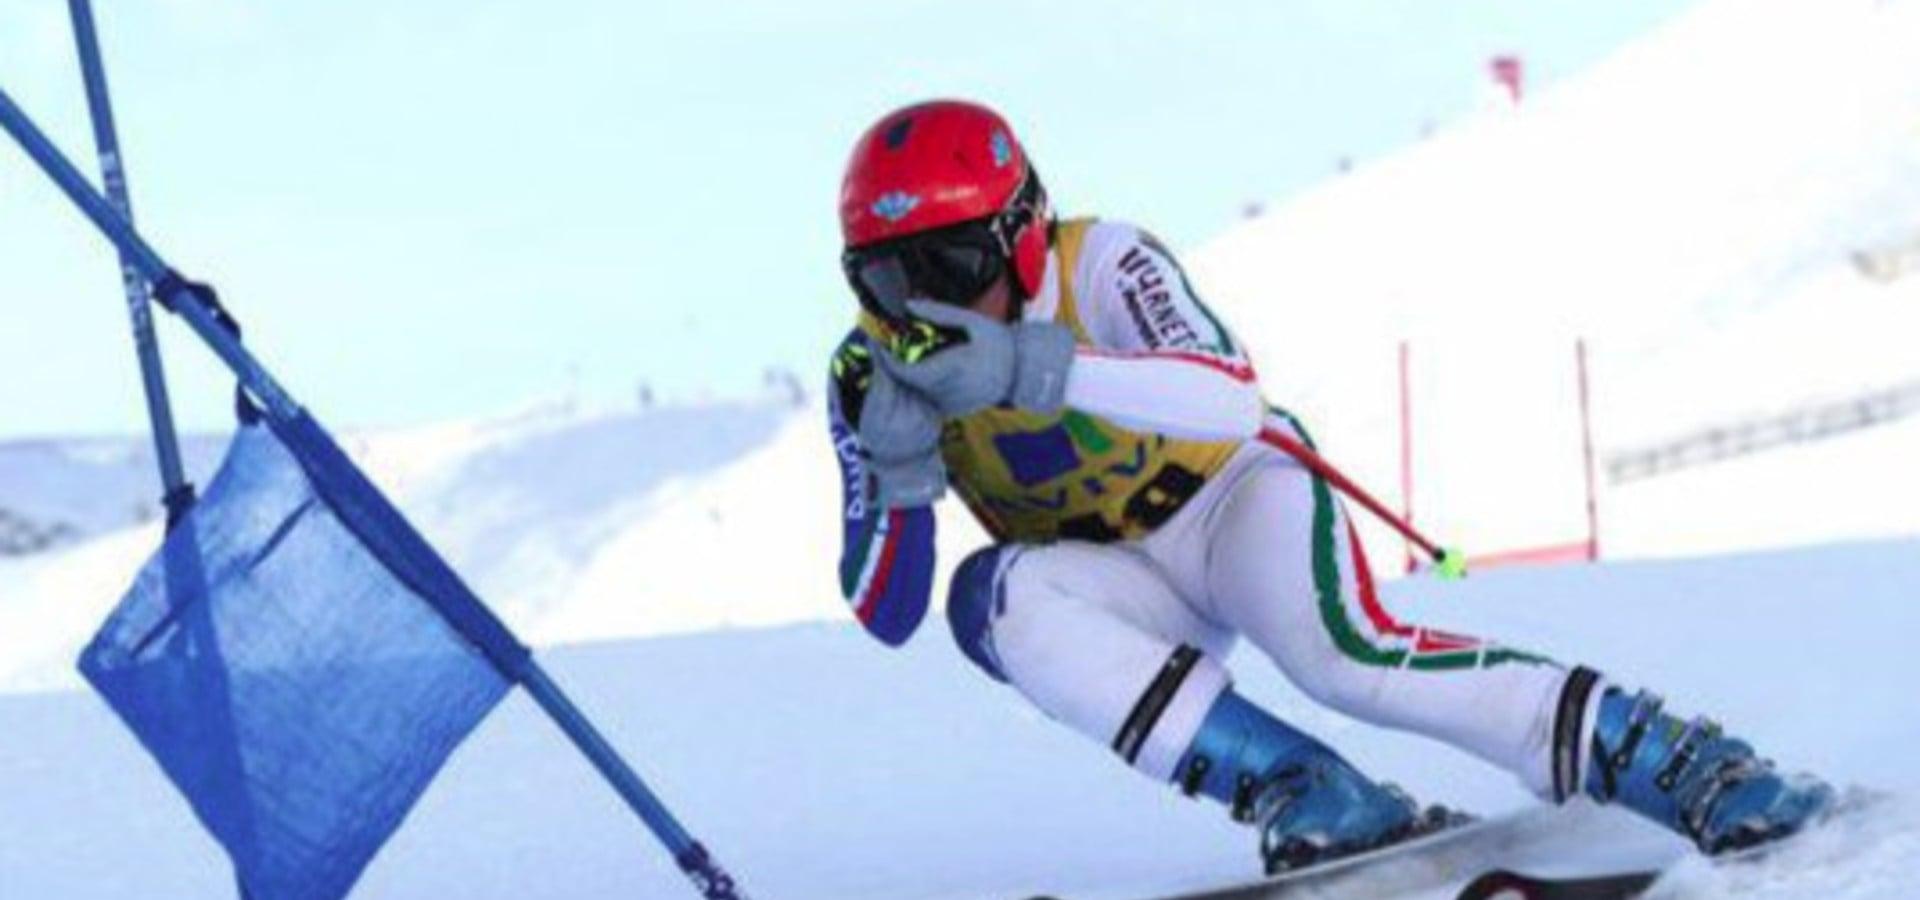 05.02.2017 Granpremio Ragazzi/Allievi slalom gigante